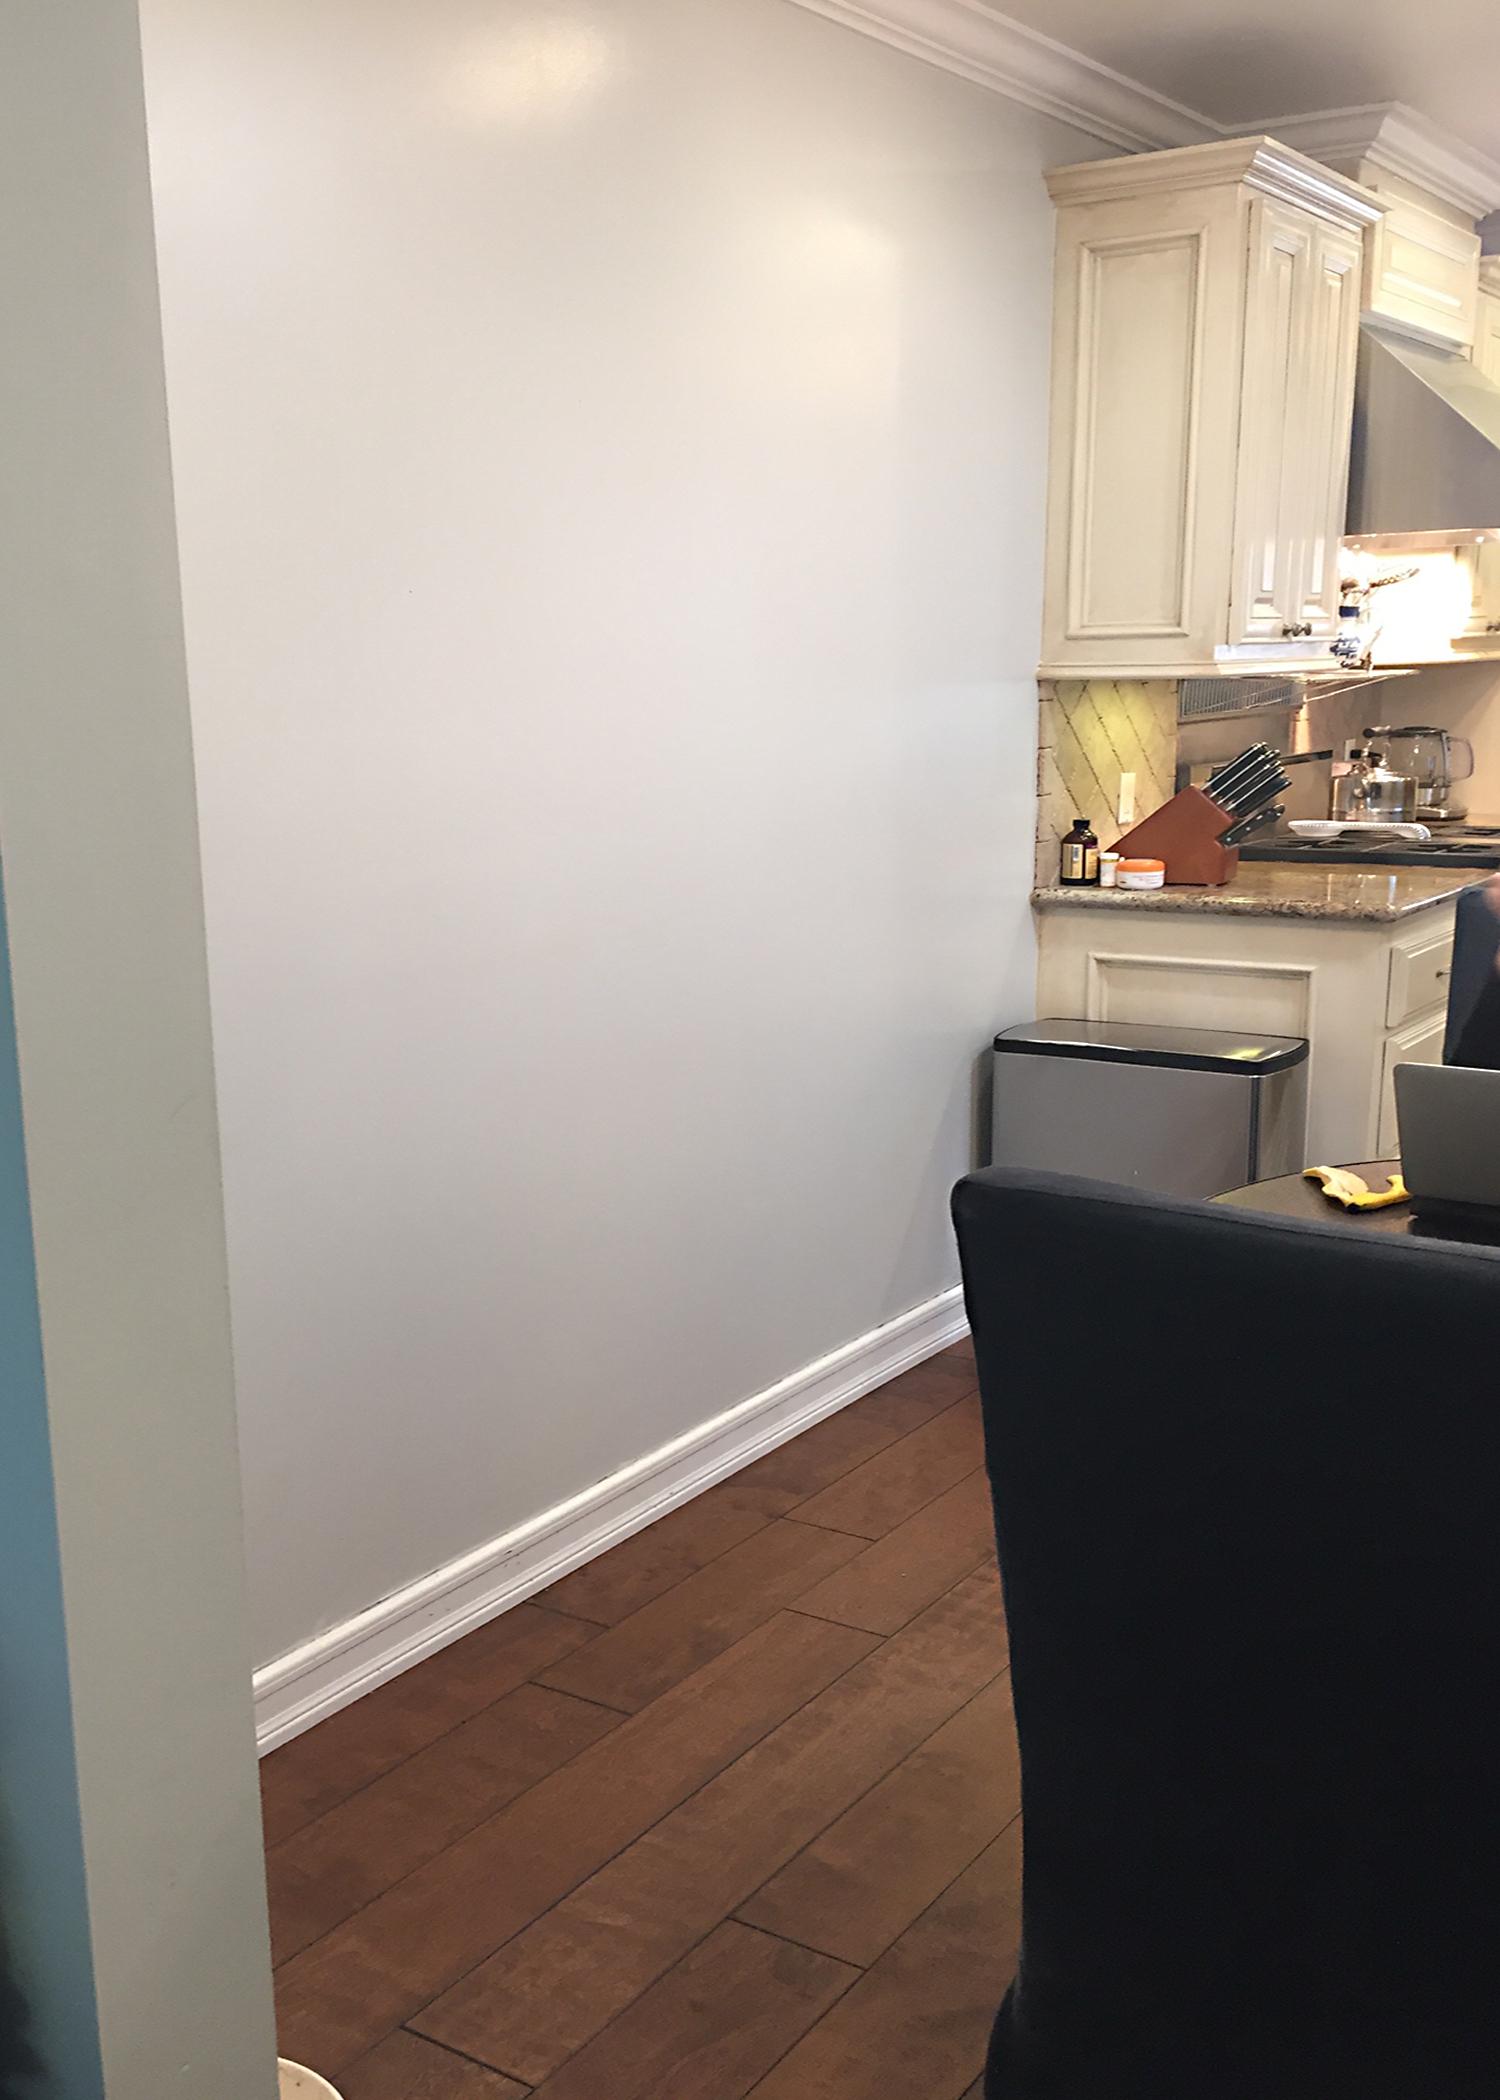 before - left side as enter kitchen